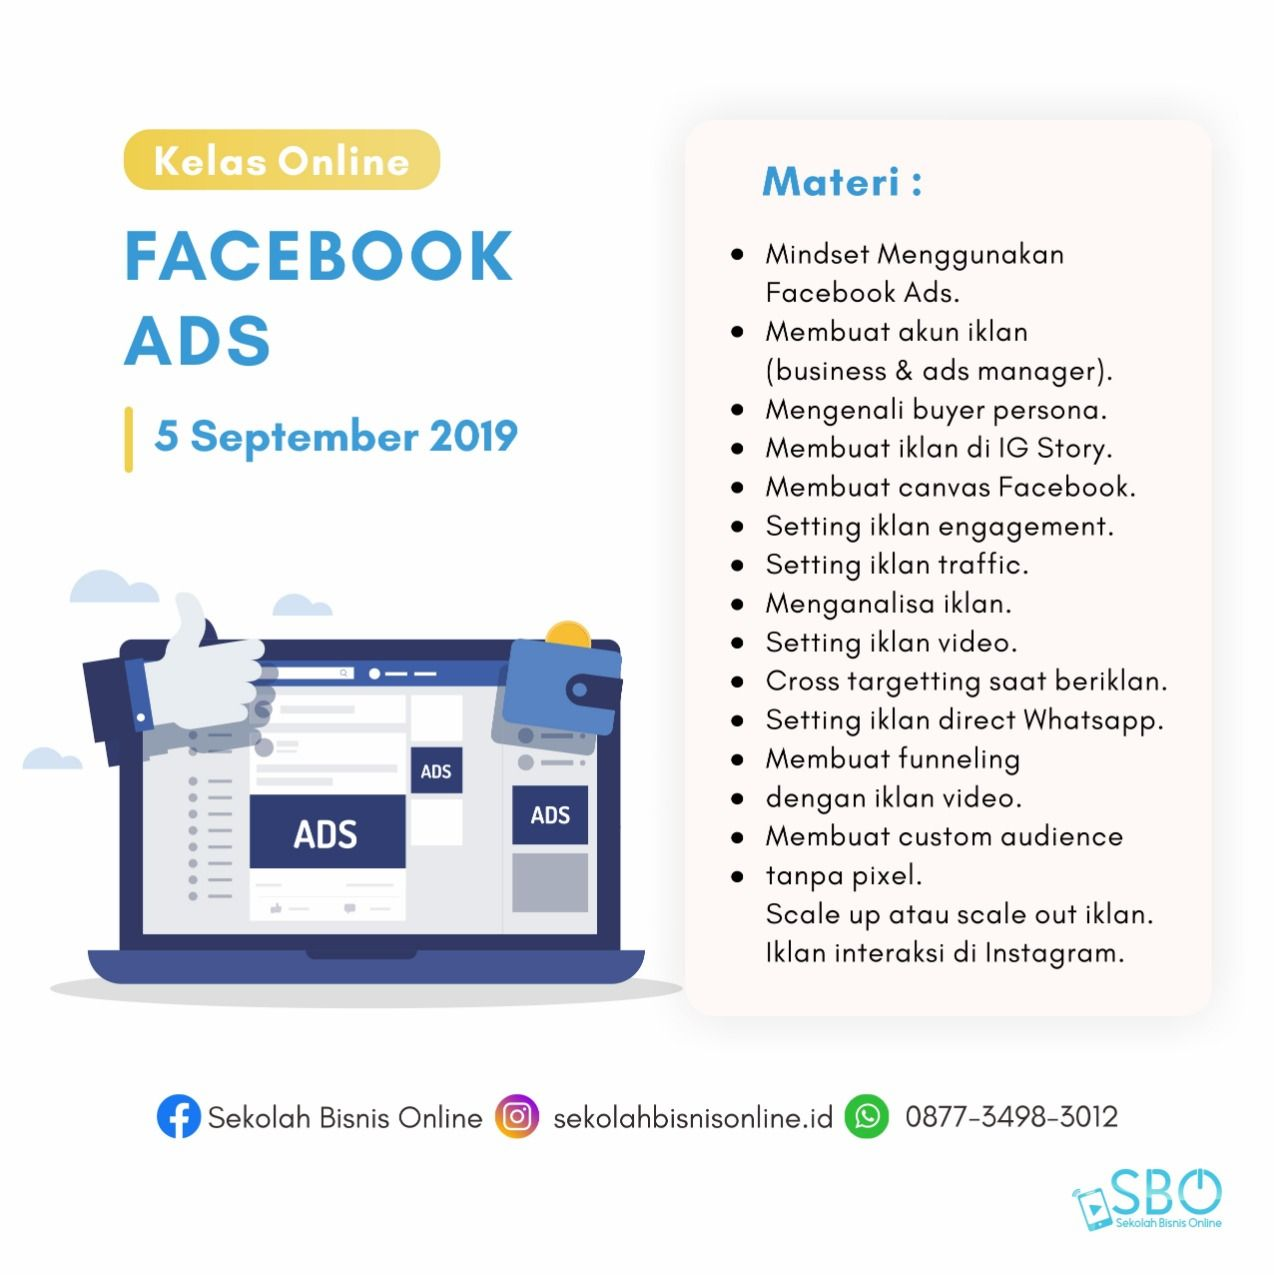 Facebook Ads Manager Facebook Adsense Facebook Ads Adalah